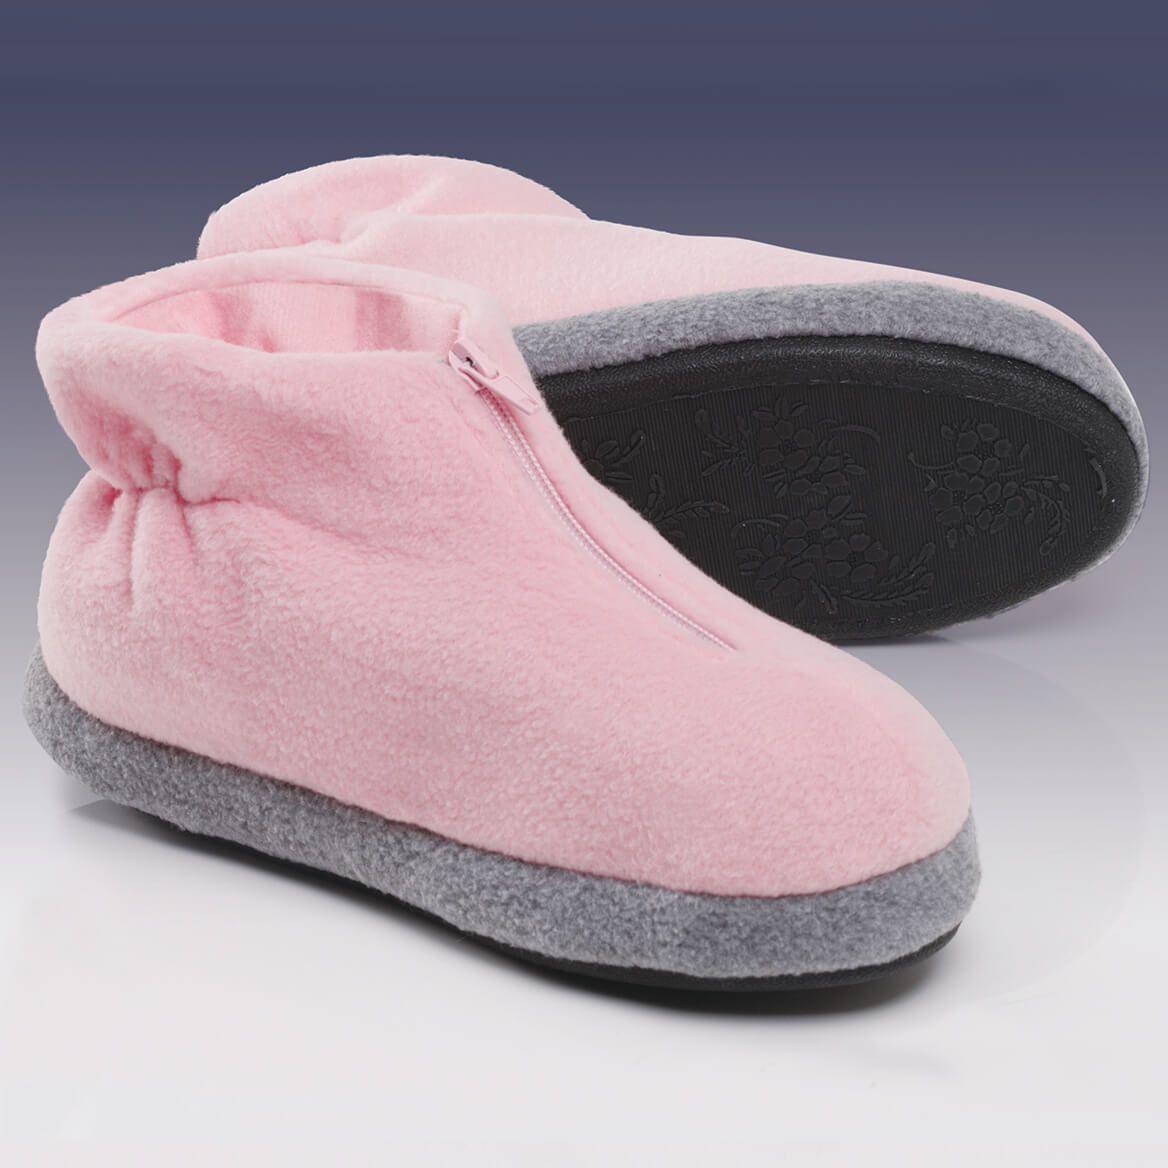 Zipper Slippers-370158